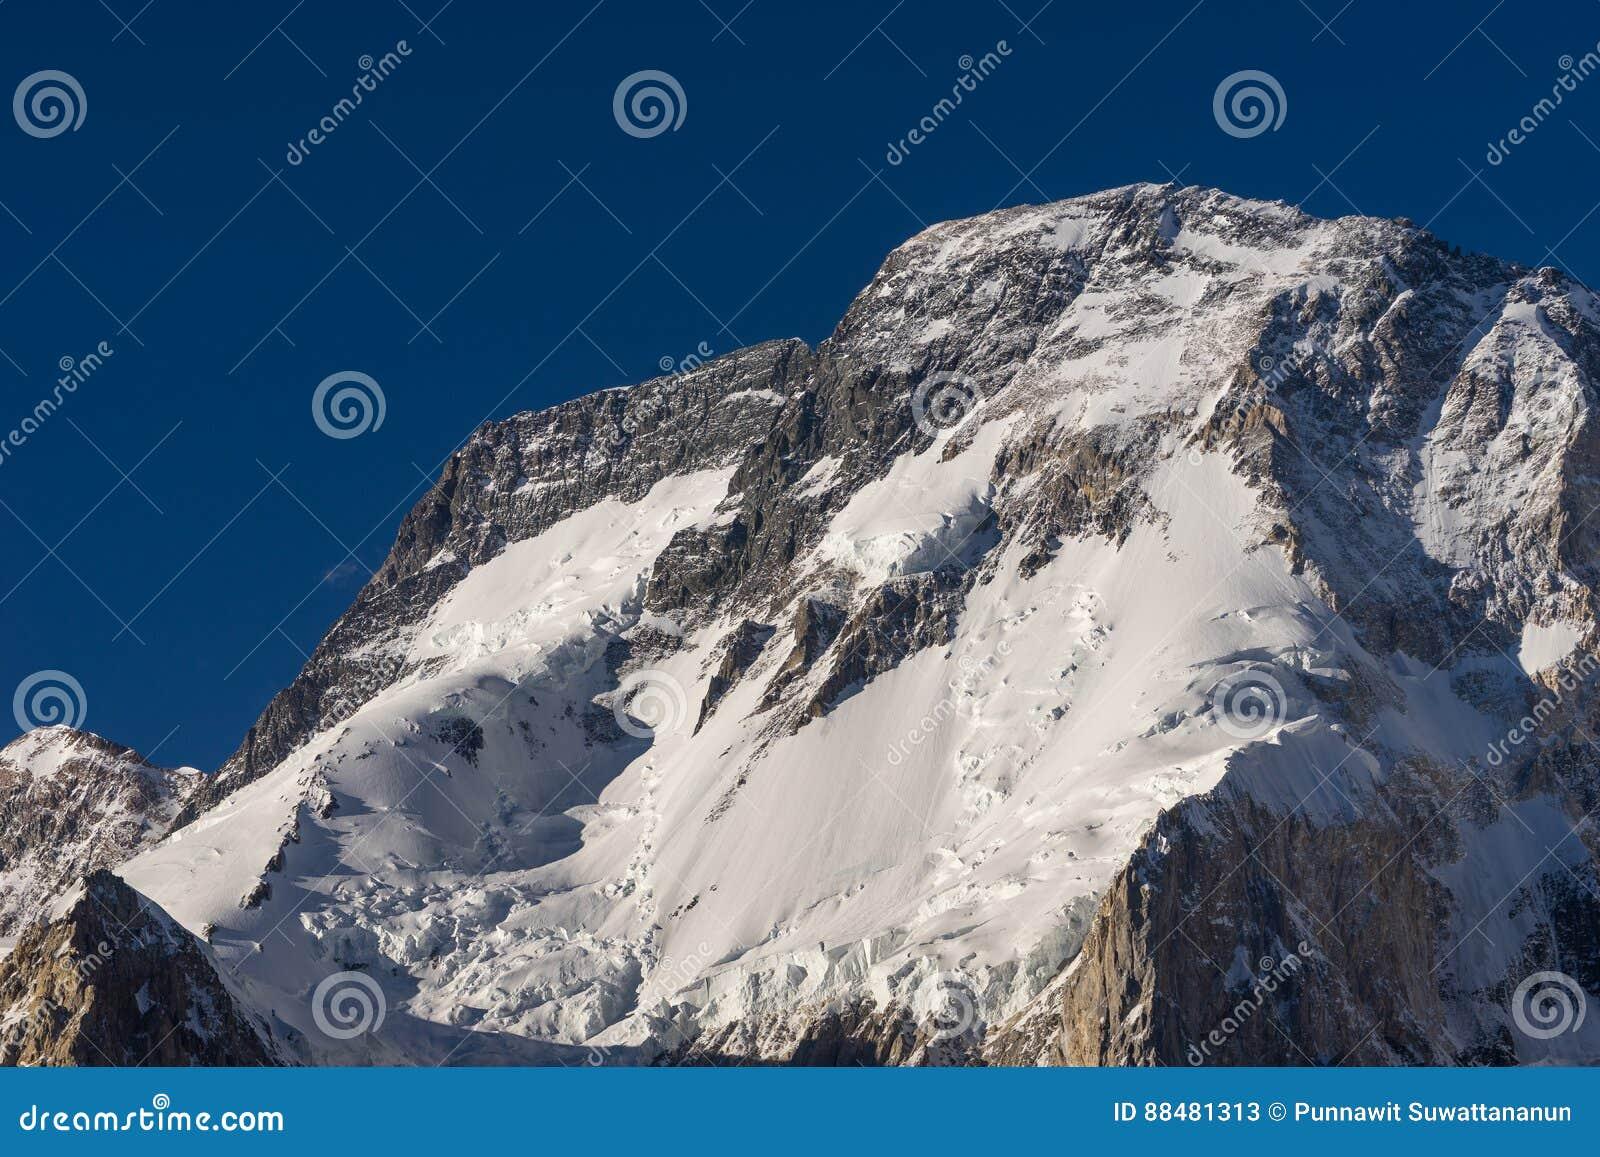 Broadpeak in Karakorum-Gebirgszug, K2 Wanderung, Gilgit, Pakistan